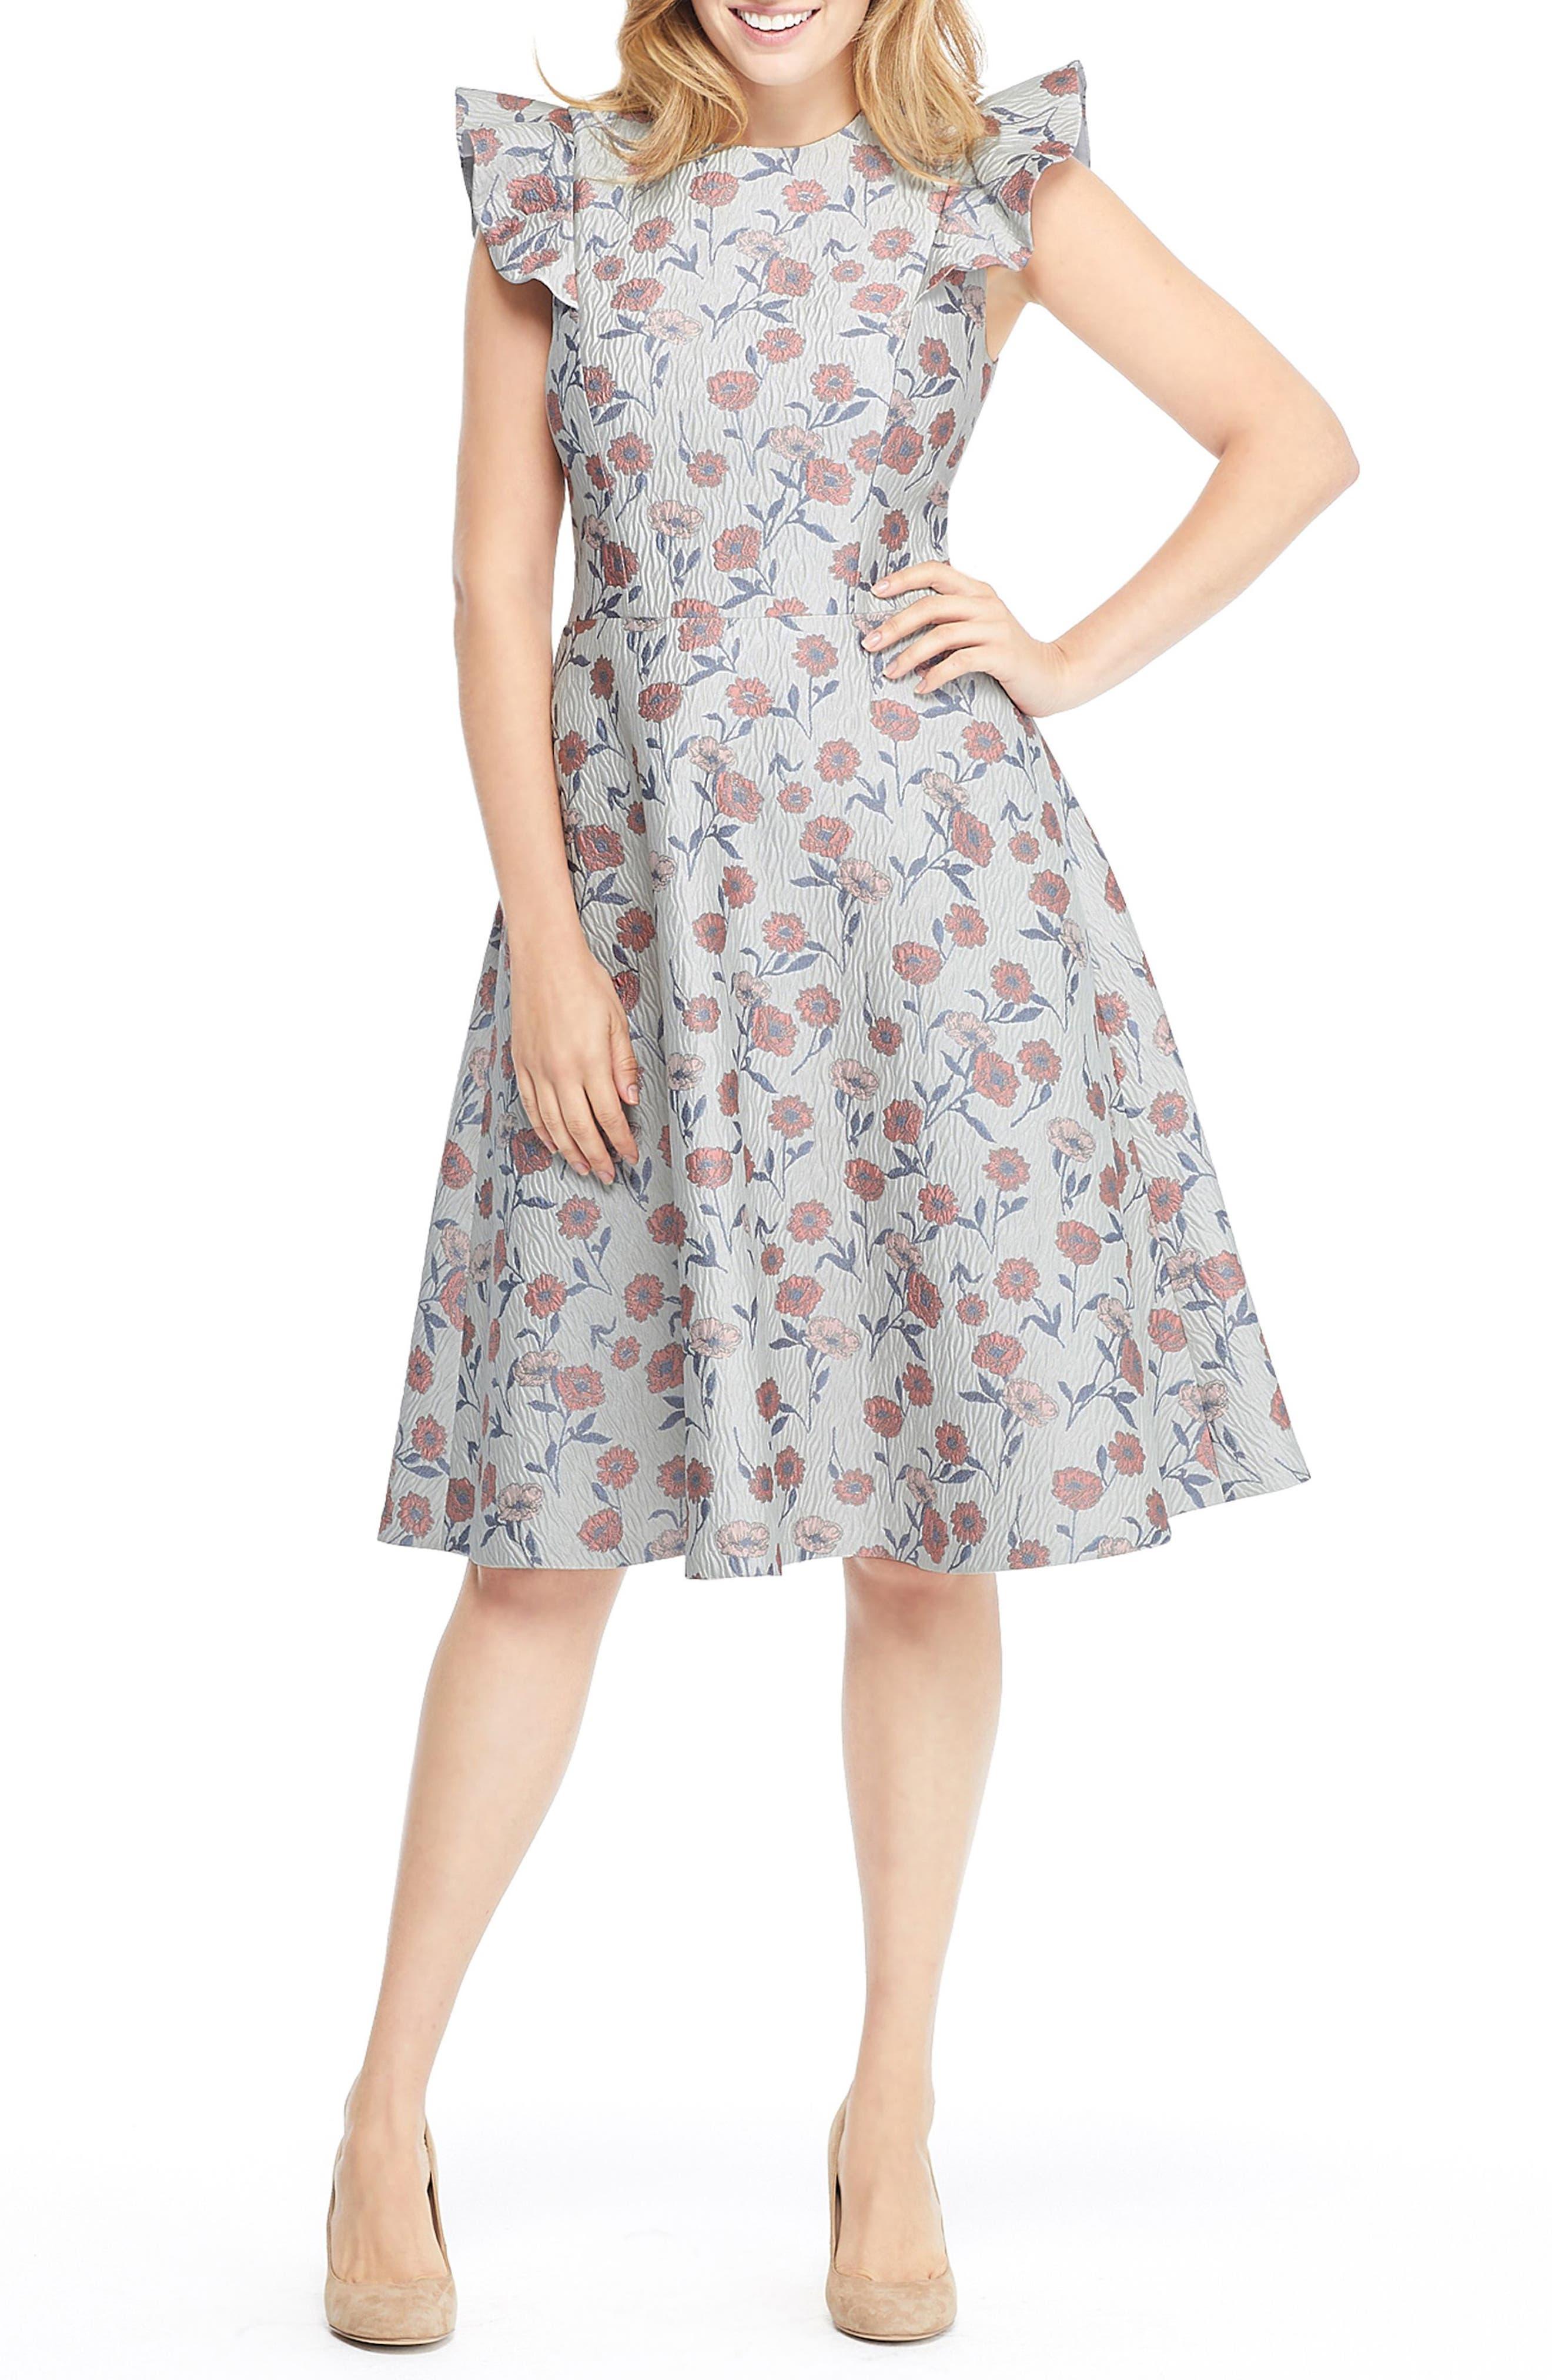 floral dresses for petite women